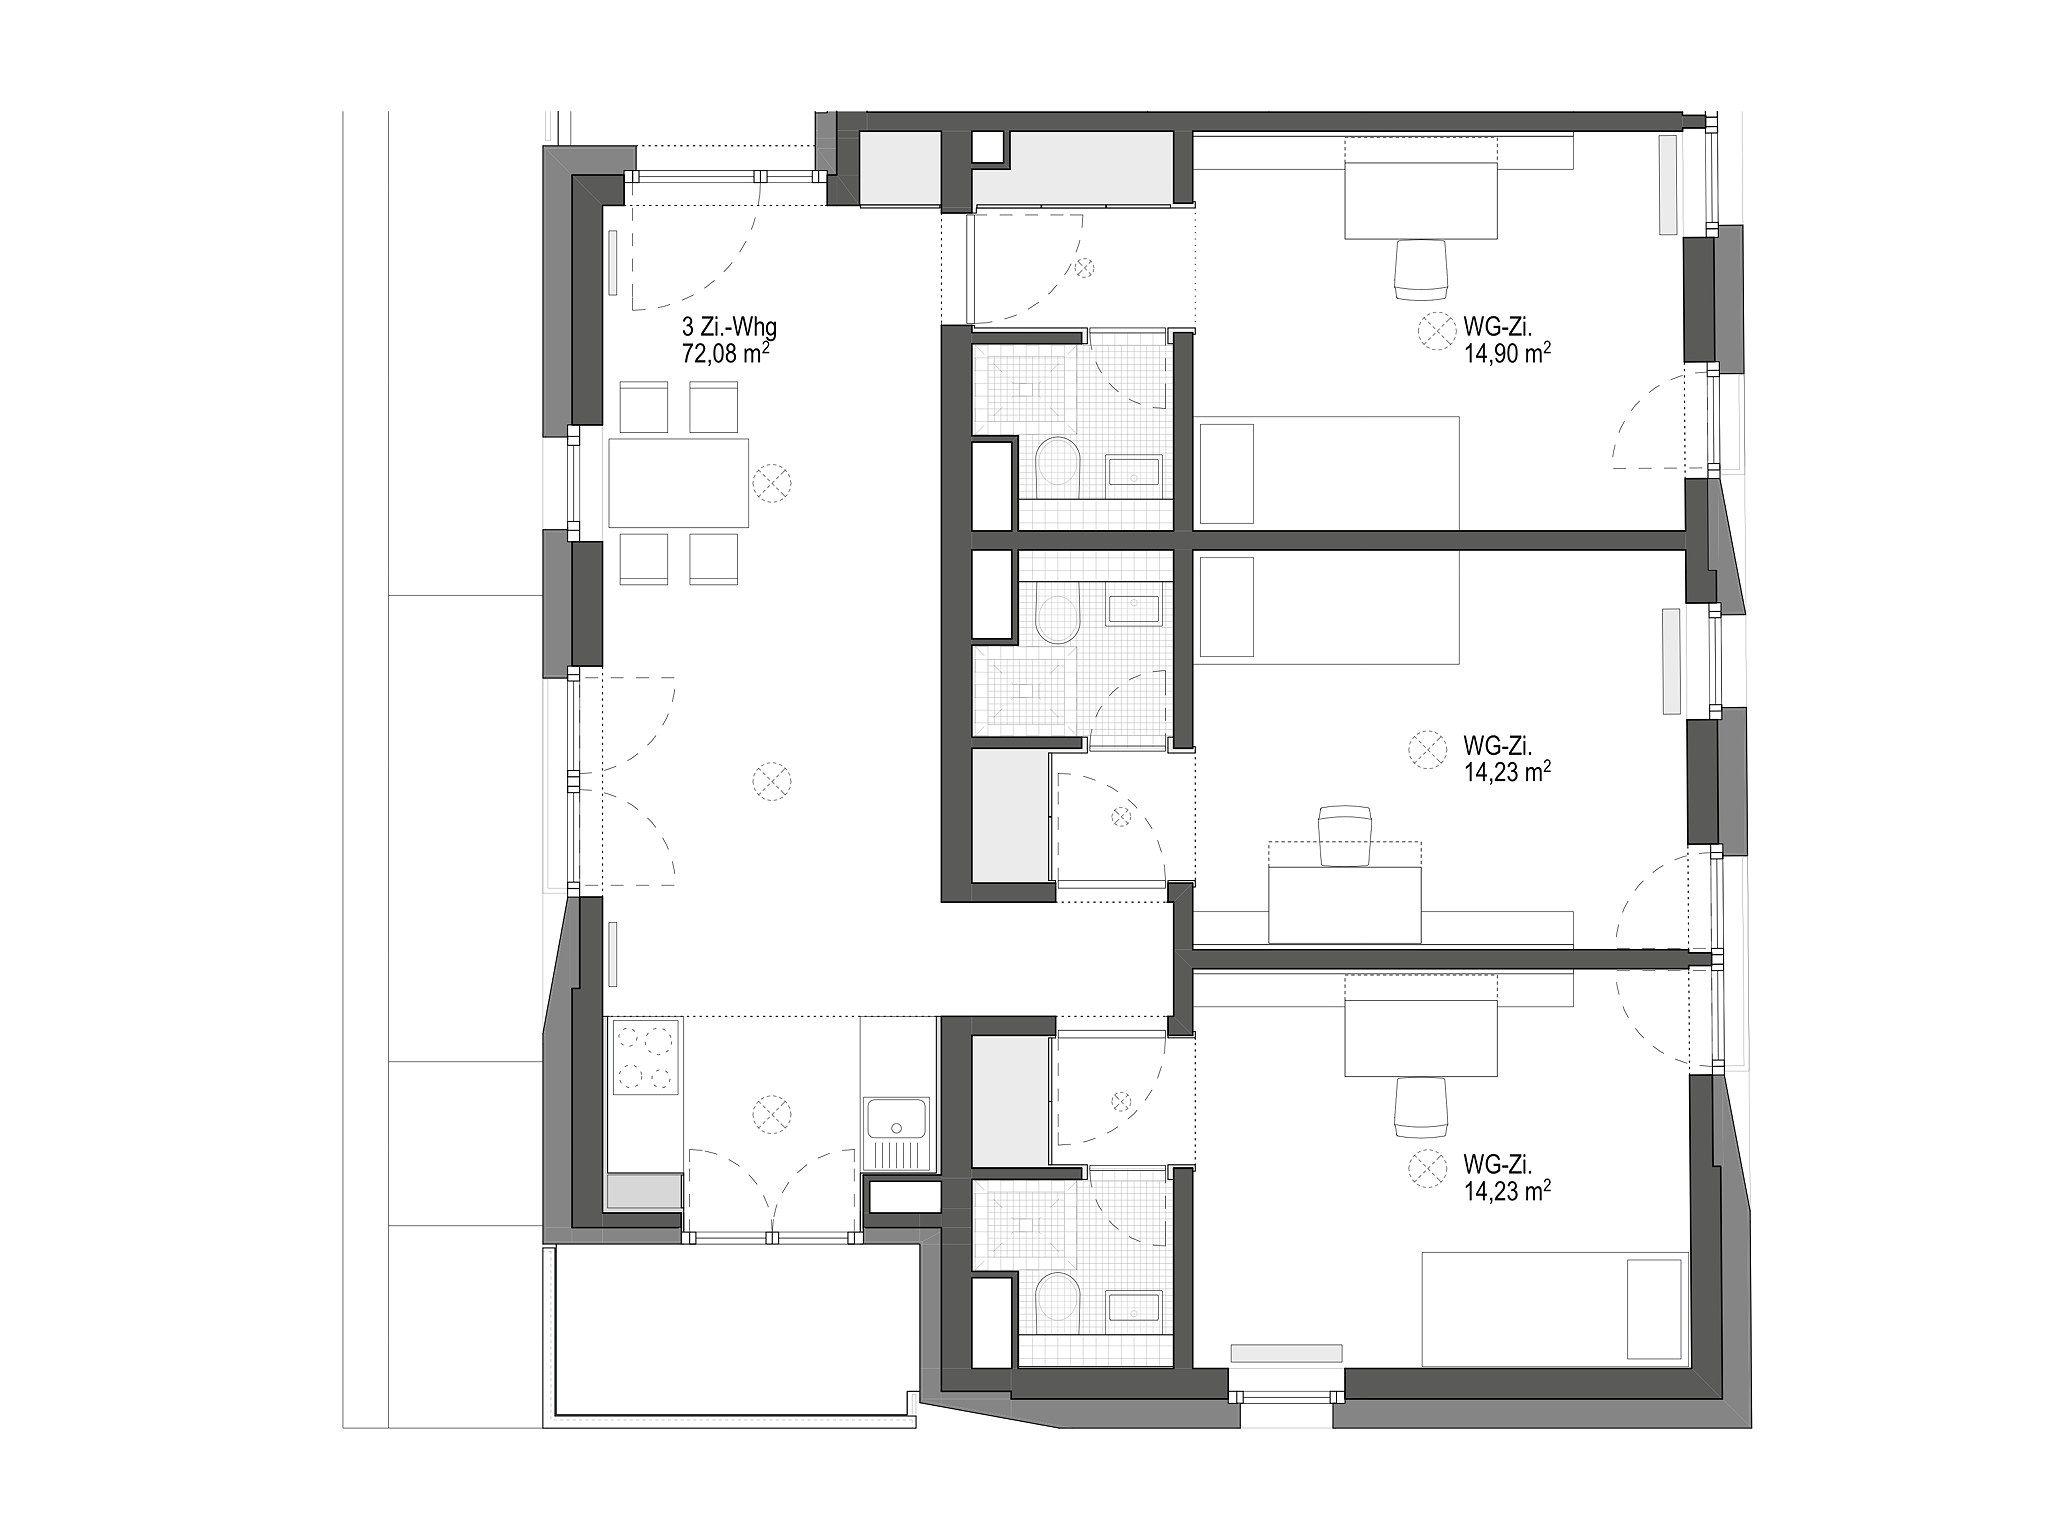 3 zimmer wohngemeinschaft geier maass architekten grundrisse pinterest. Black Bedroom Furniture Sets. Home Design Ideas